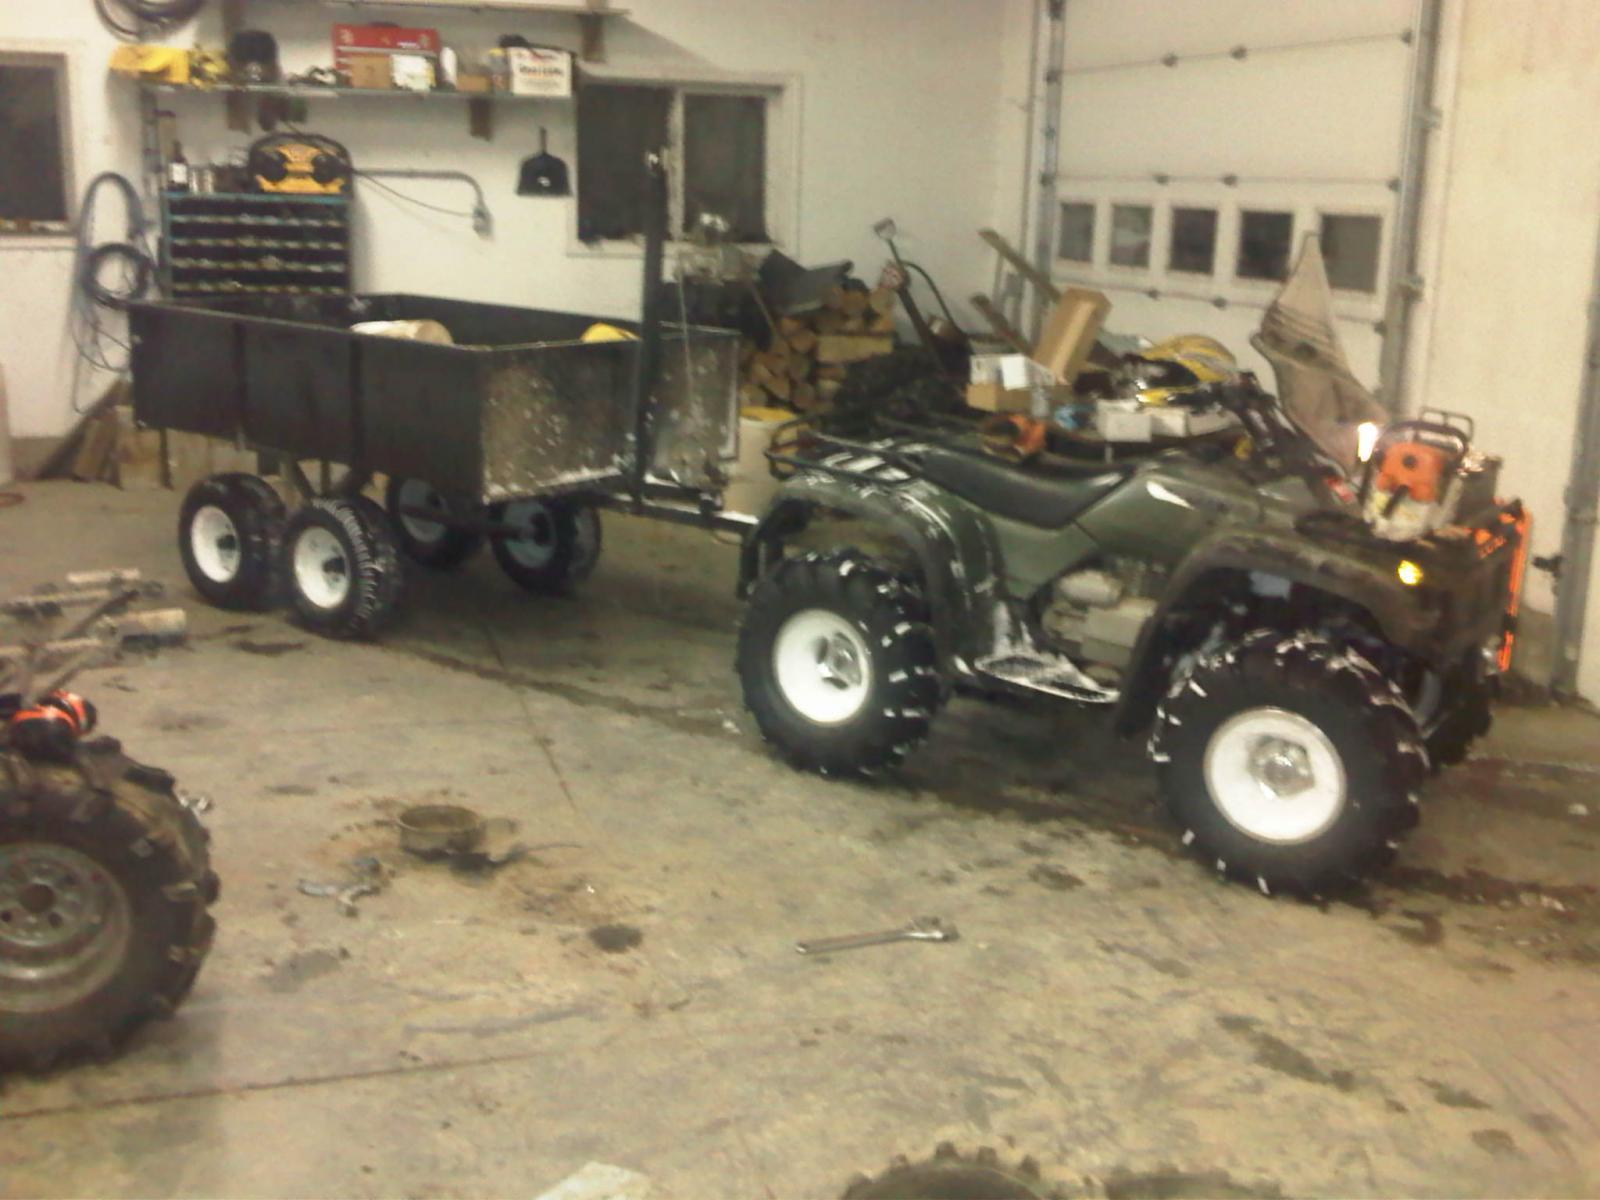 ATV Dump Trailer - Honda Foreman Forums : Rubicon, Rincon